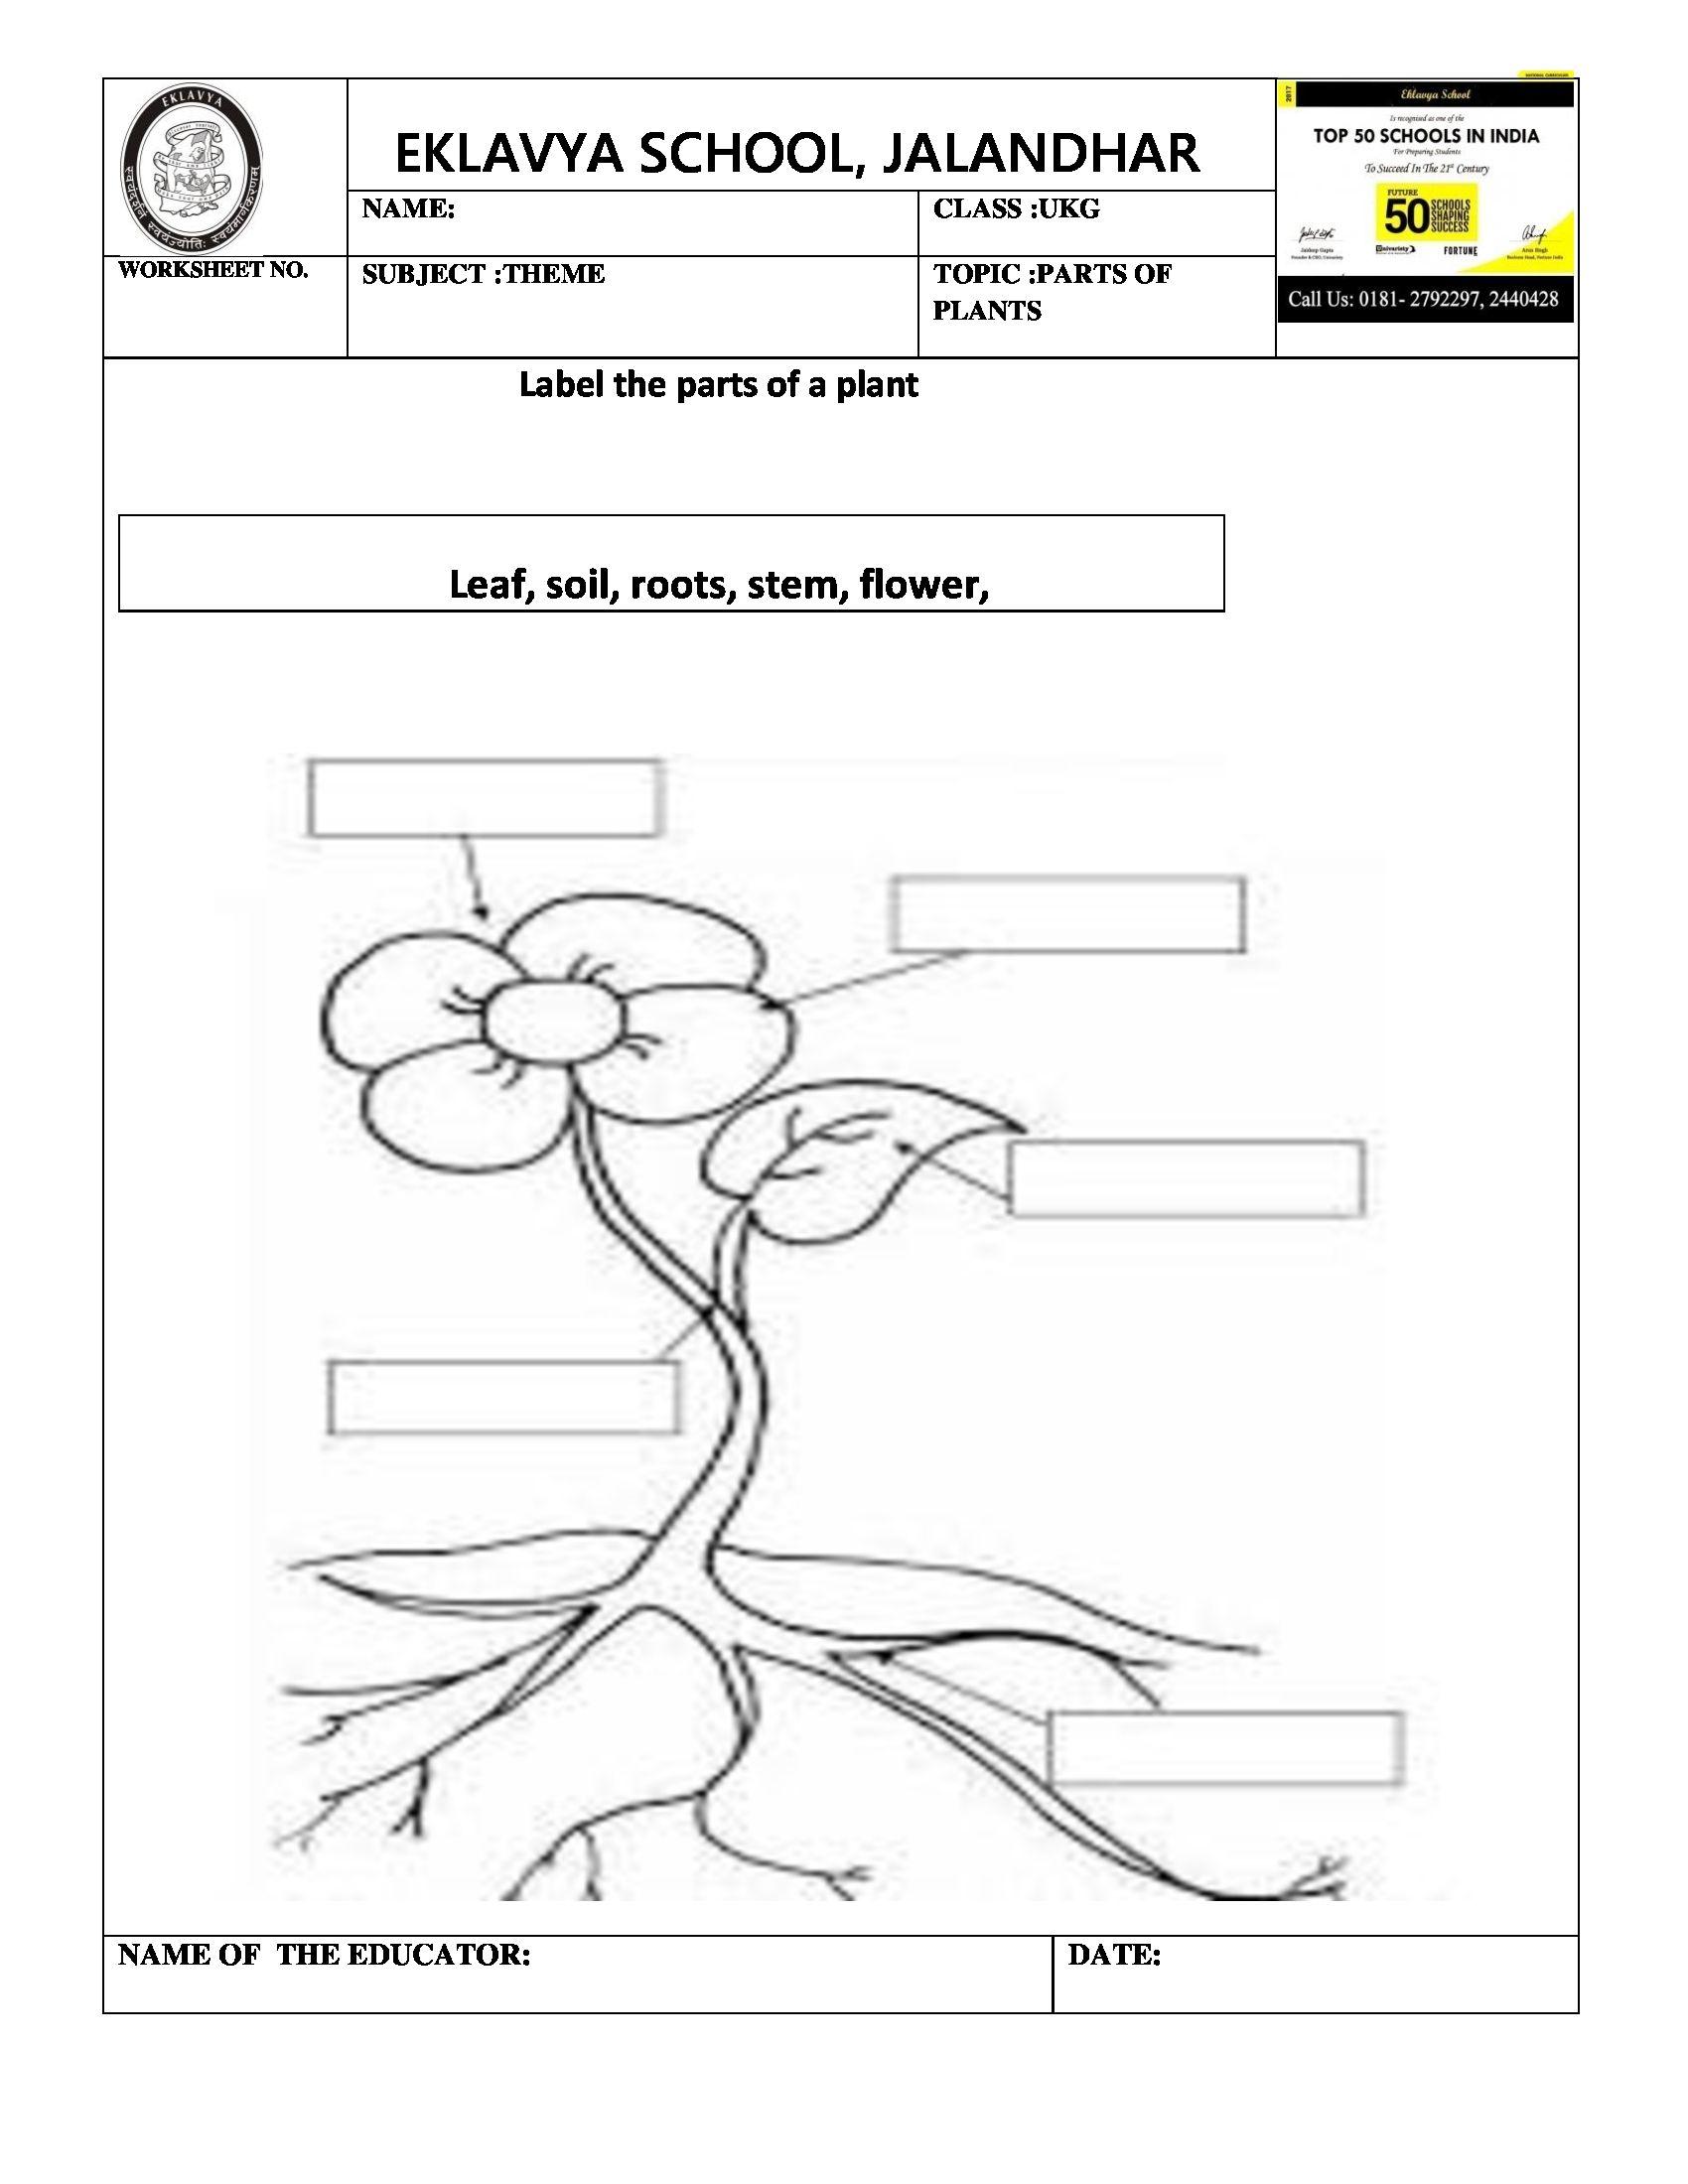 Worksheet On Parts Of Plants